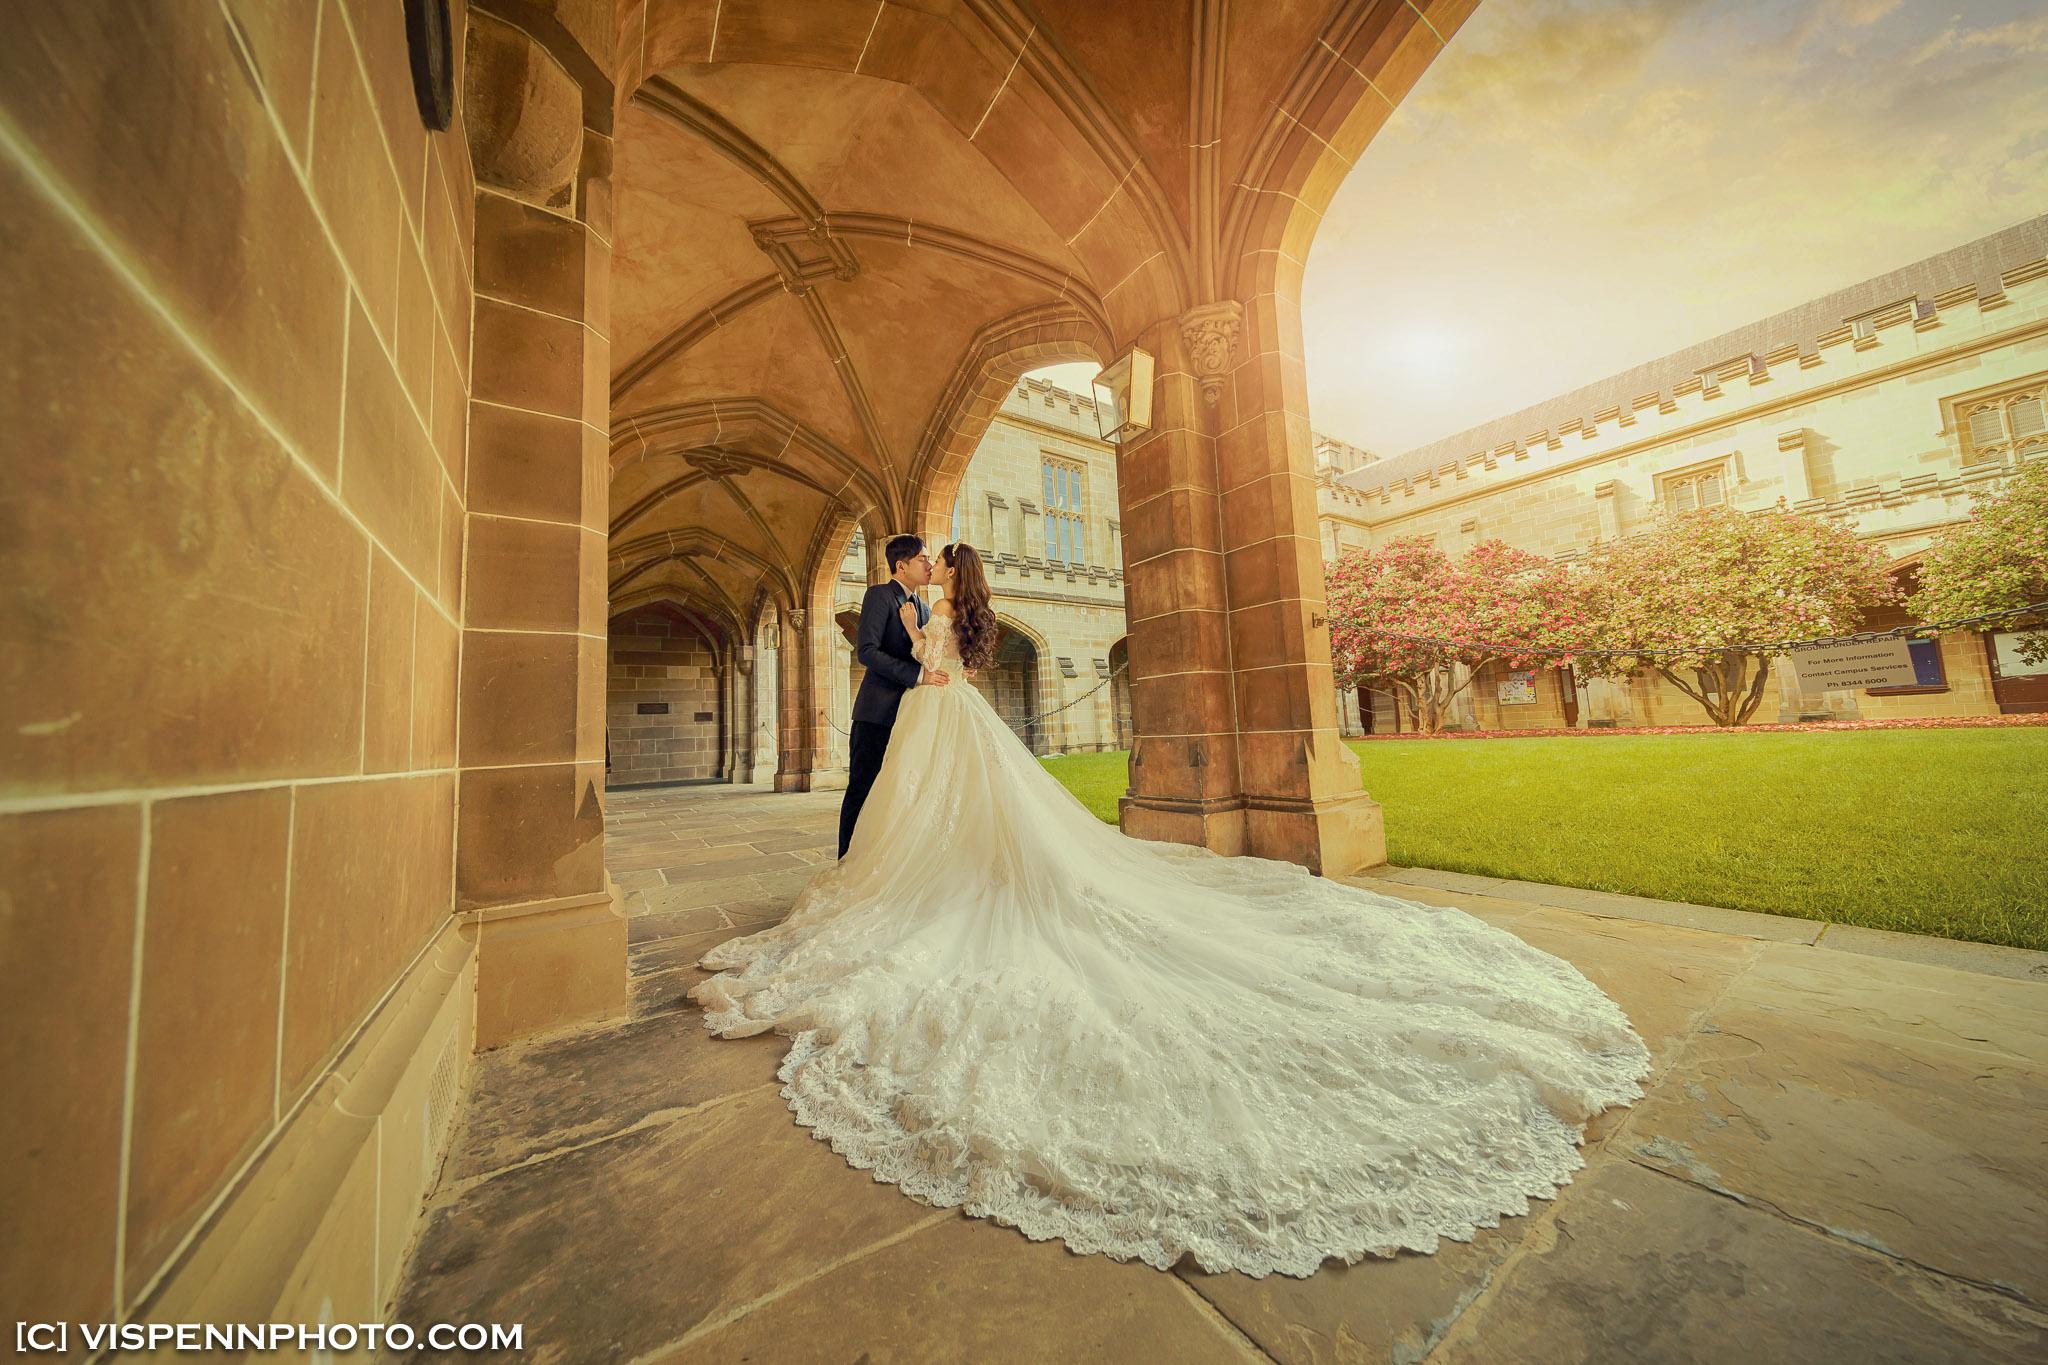 PRE WEDDING Photography Melbourne VISPENN 墨尔本 婚纱照 结婚照 婚纱摄影 VISPENN JackySerena 0427 1